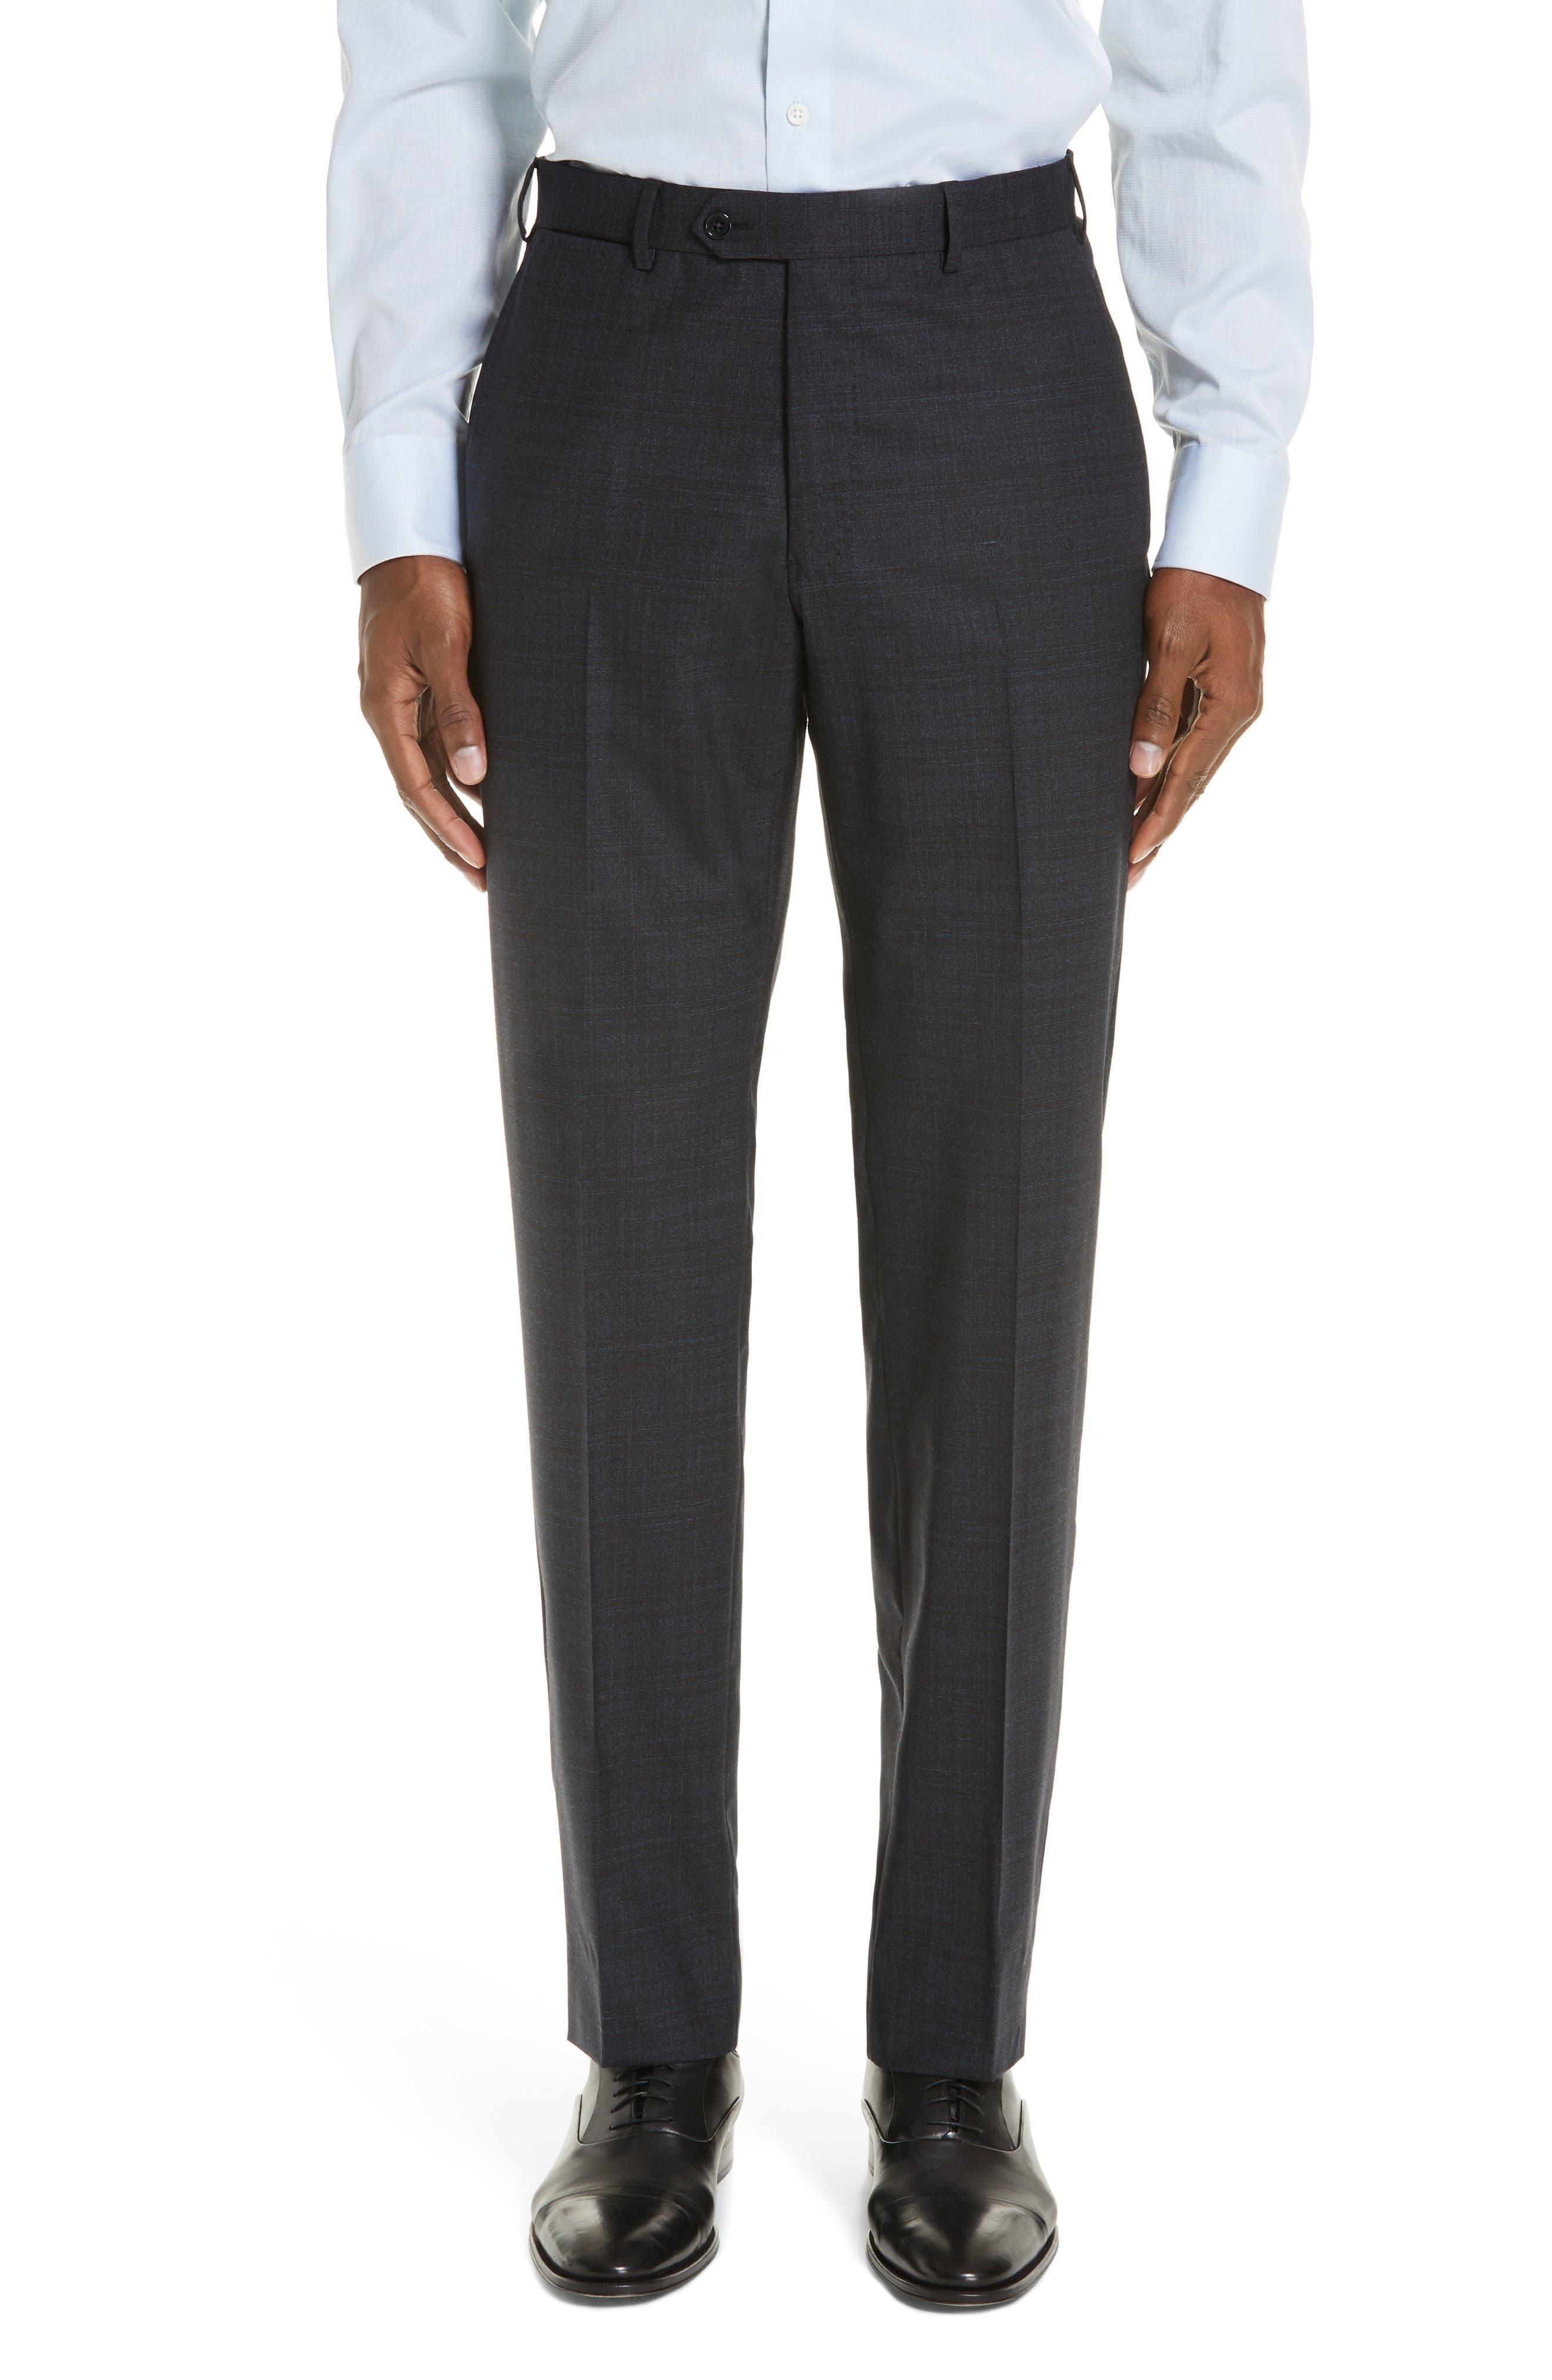 G-Line Trim Fit Stretch Plaid Wool Suit,                             Alternate thumbnail 6, color,                             NAVY/ BROWN